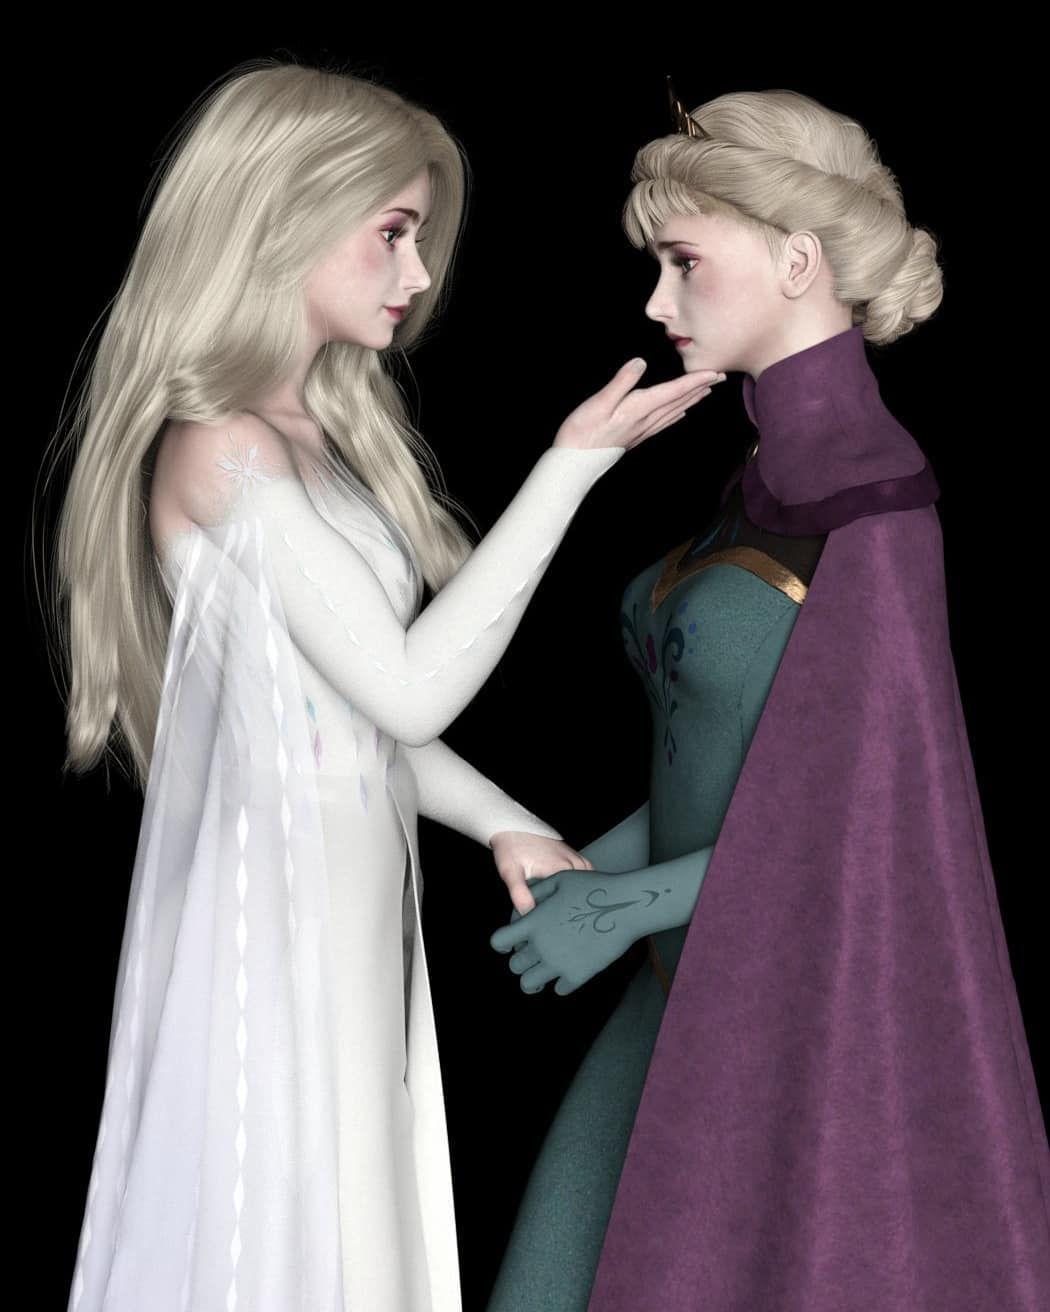 Elsa The Fifth Spirit On Instagram Credit Xlayers Haru On Twitter In 2020 Disney Prinzessinnen Zeichnungen Charakterdesign Disney Prinzessin Zeichnungen